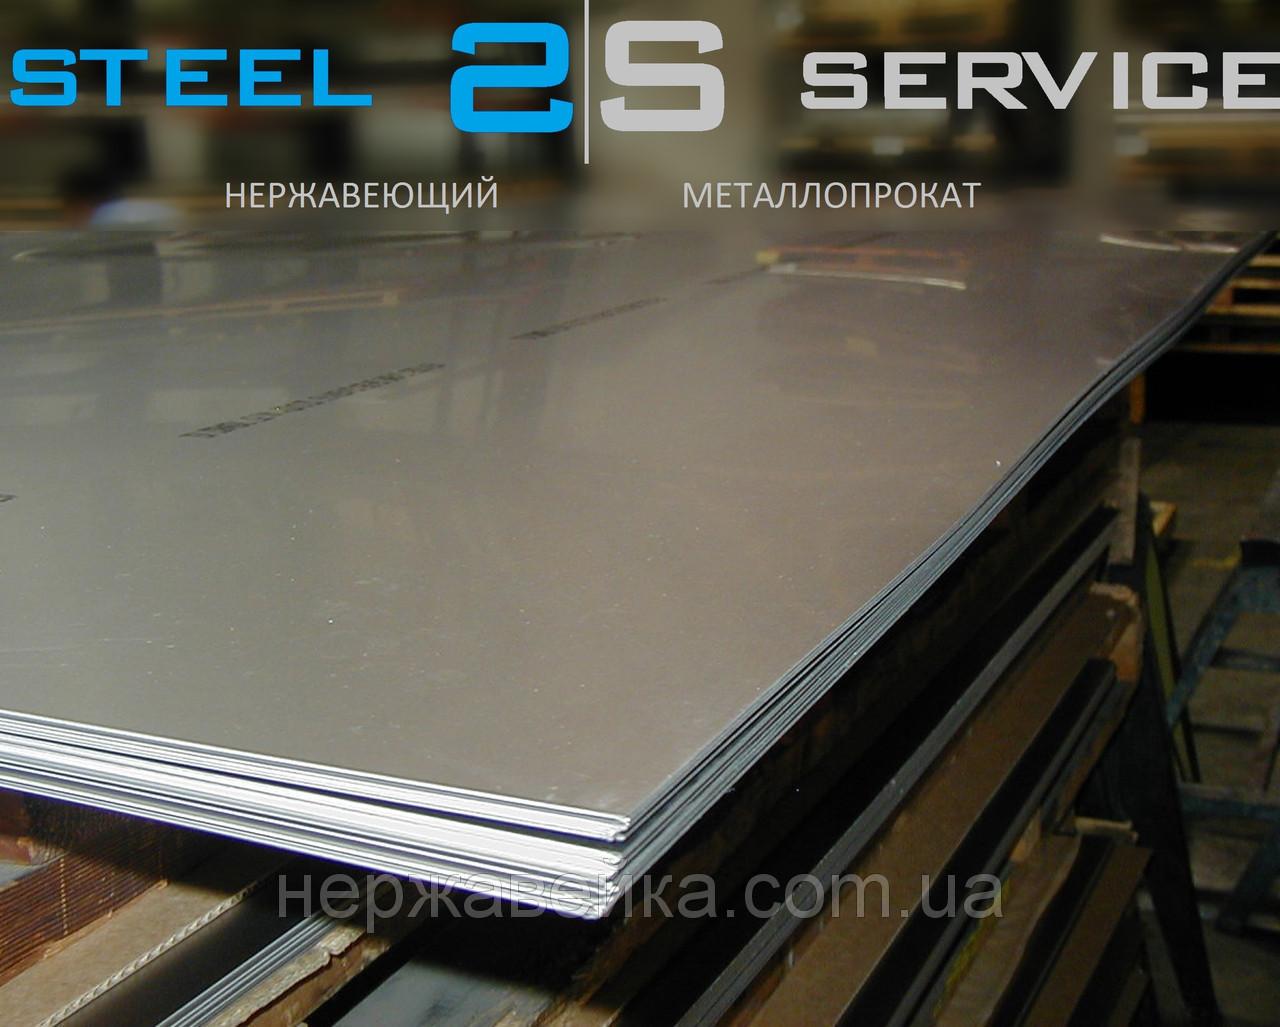 Нержавеющий лист 14х1500х6000мм  AISI 316L(03Х17Н14М3) F1 - горячекатанный,  кислотостойкий